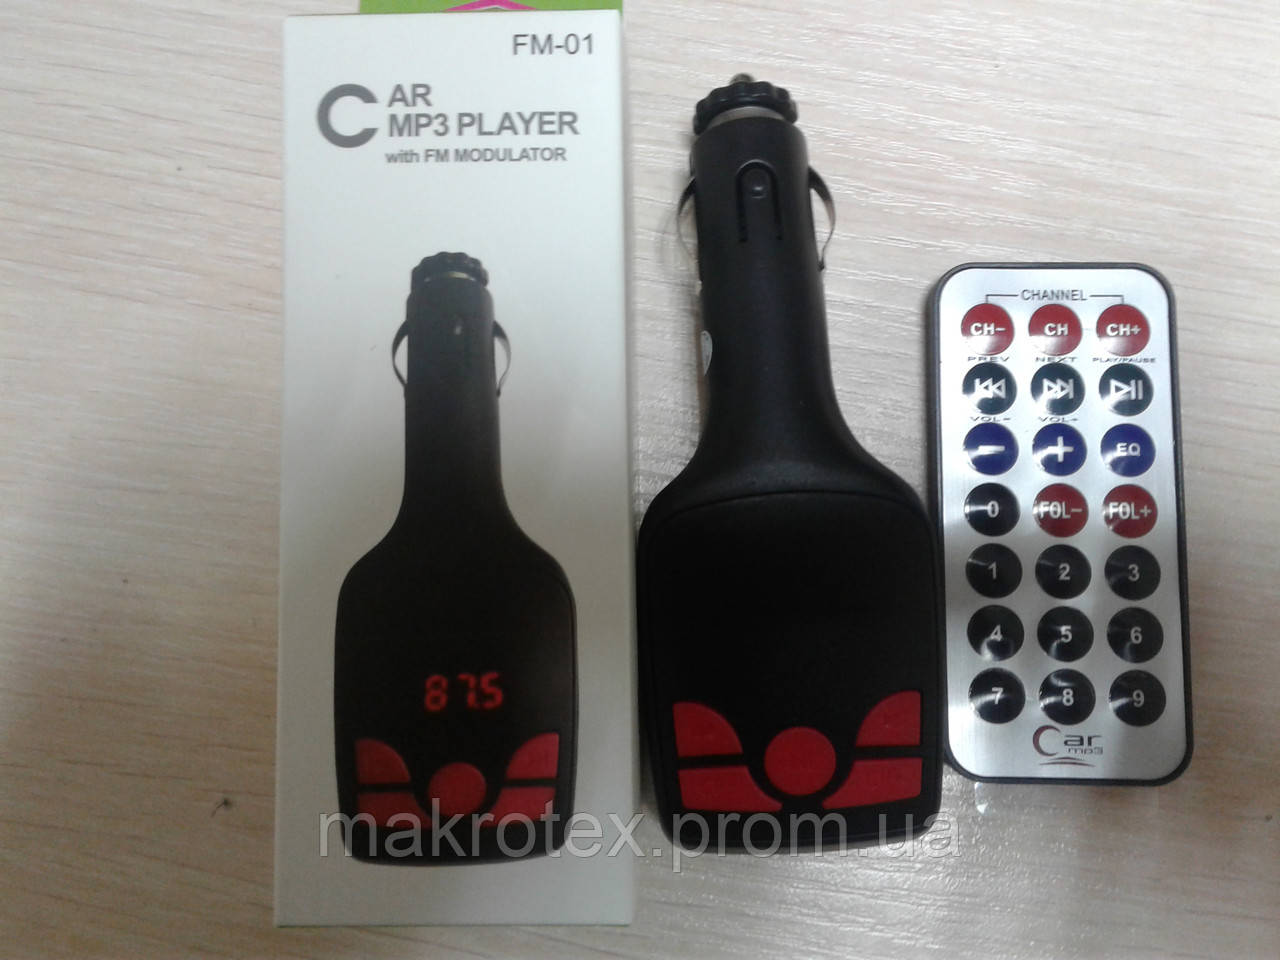 FM модулятор, Трансмиттер Car MP3 Player FM-02